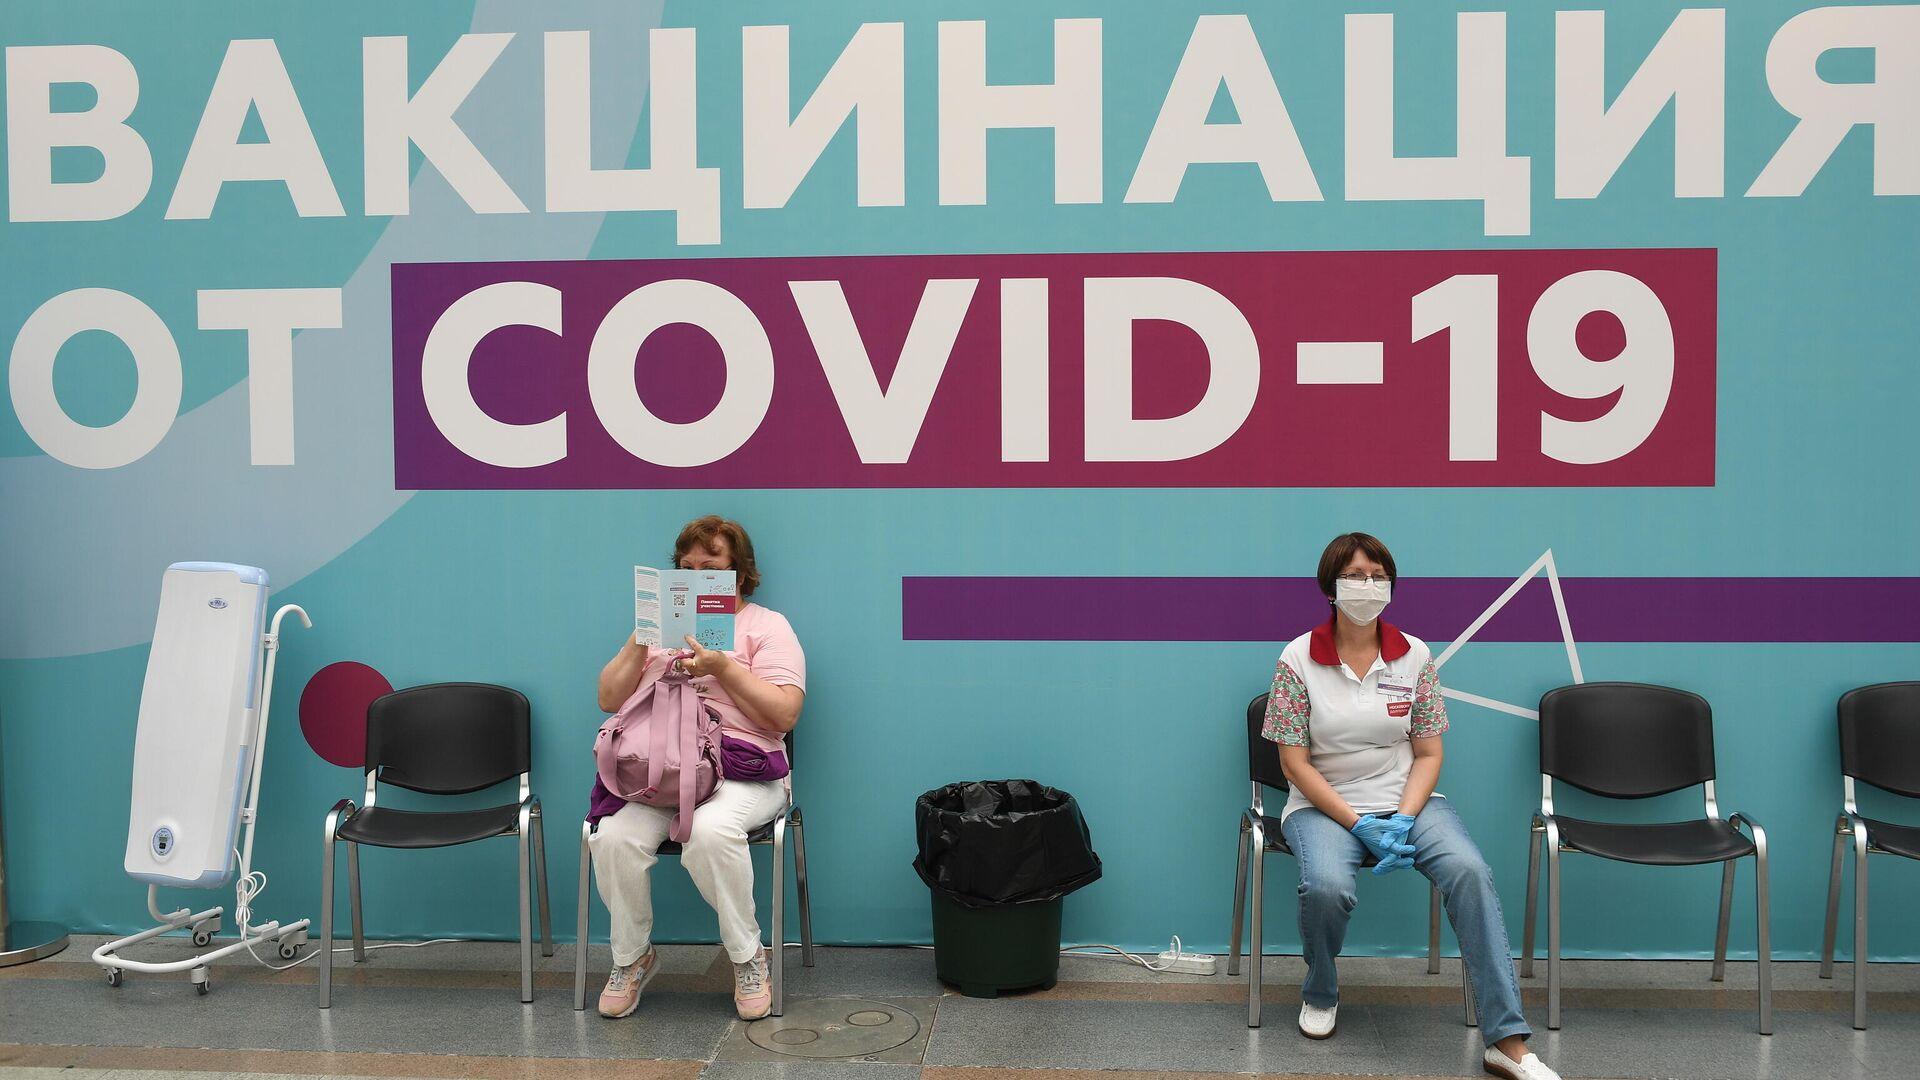 Посетители в центре вакцинации от COVID-19 в Гостином дворе в Москве - РИА Новости, 1920, 02.08.2021